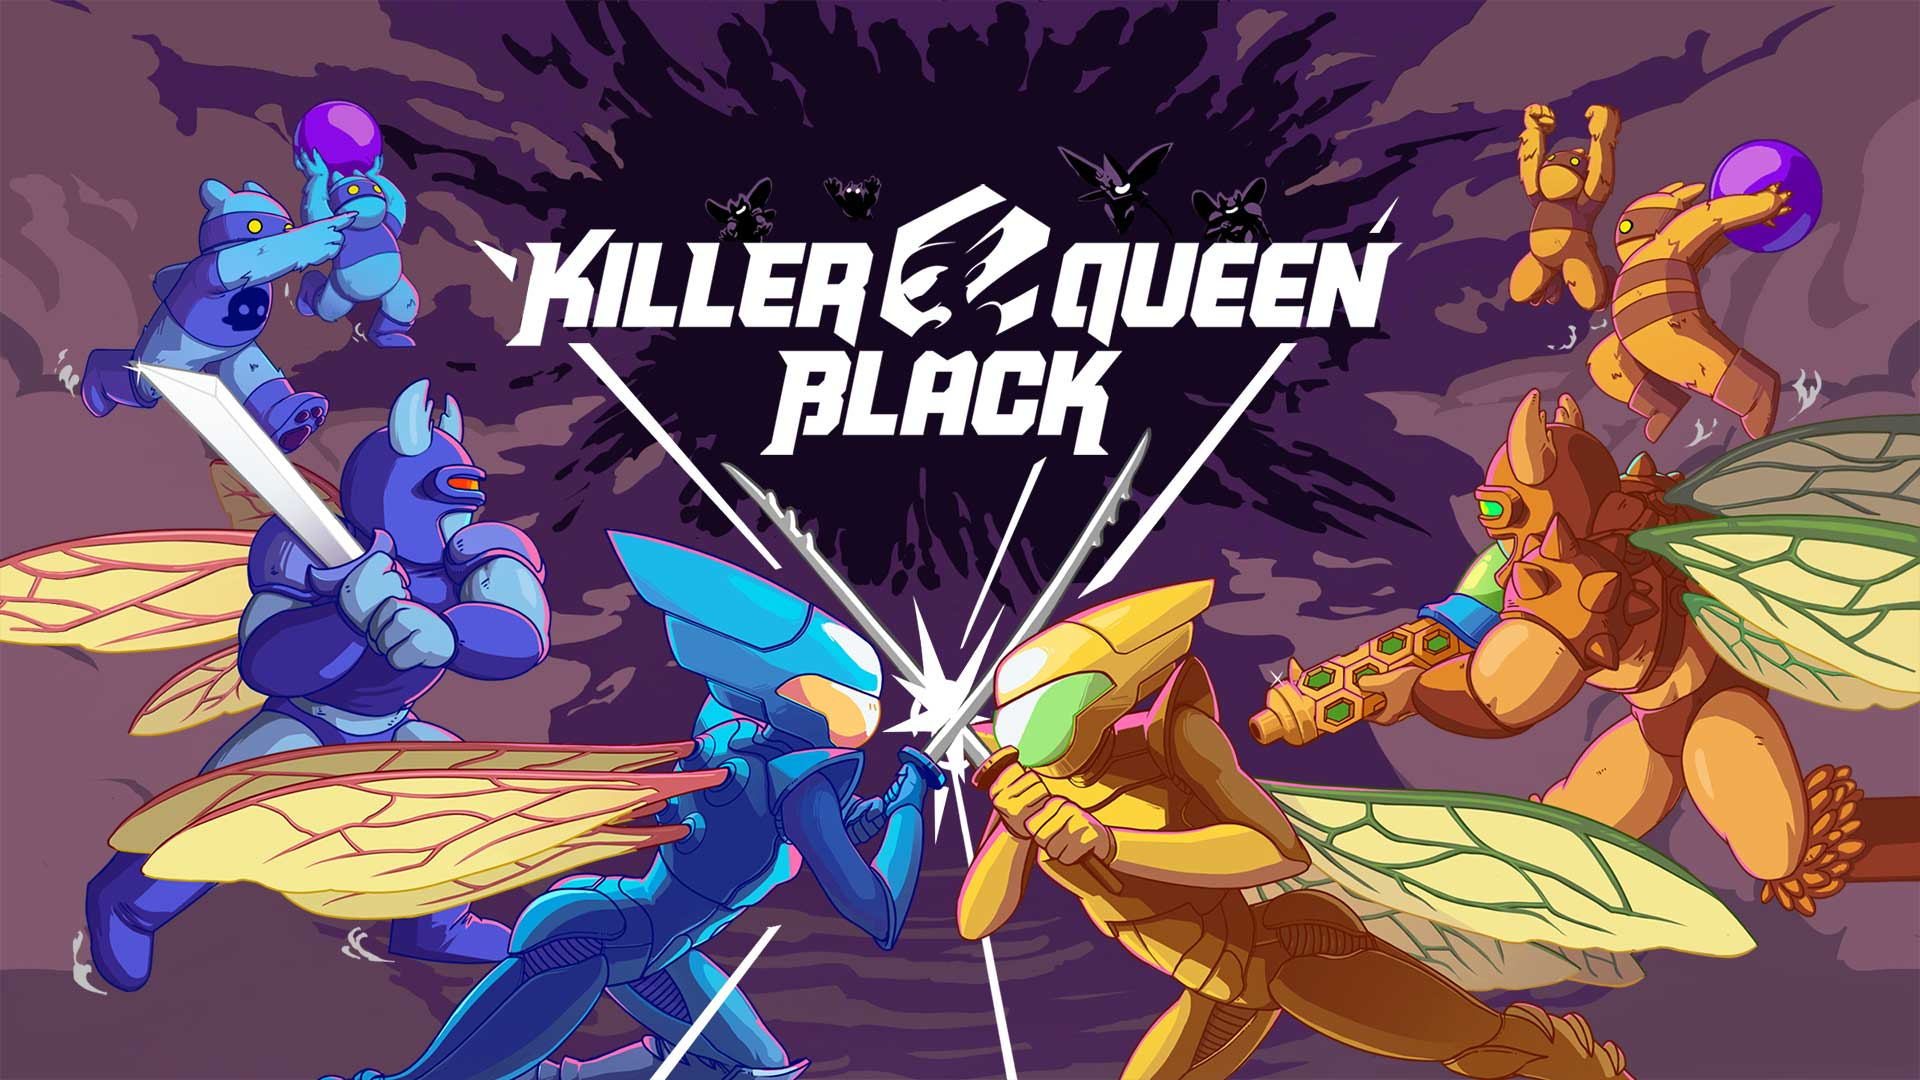 Killer Queen Black Hd Wallpaper Background Image 1920x1080 Id 927817 Wallpaper Abyss